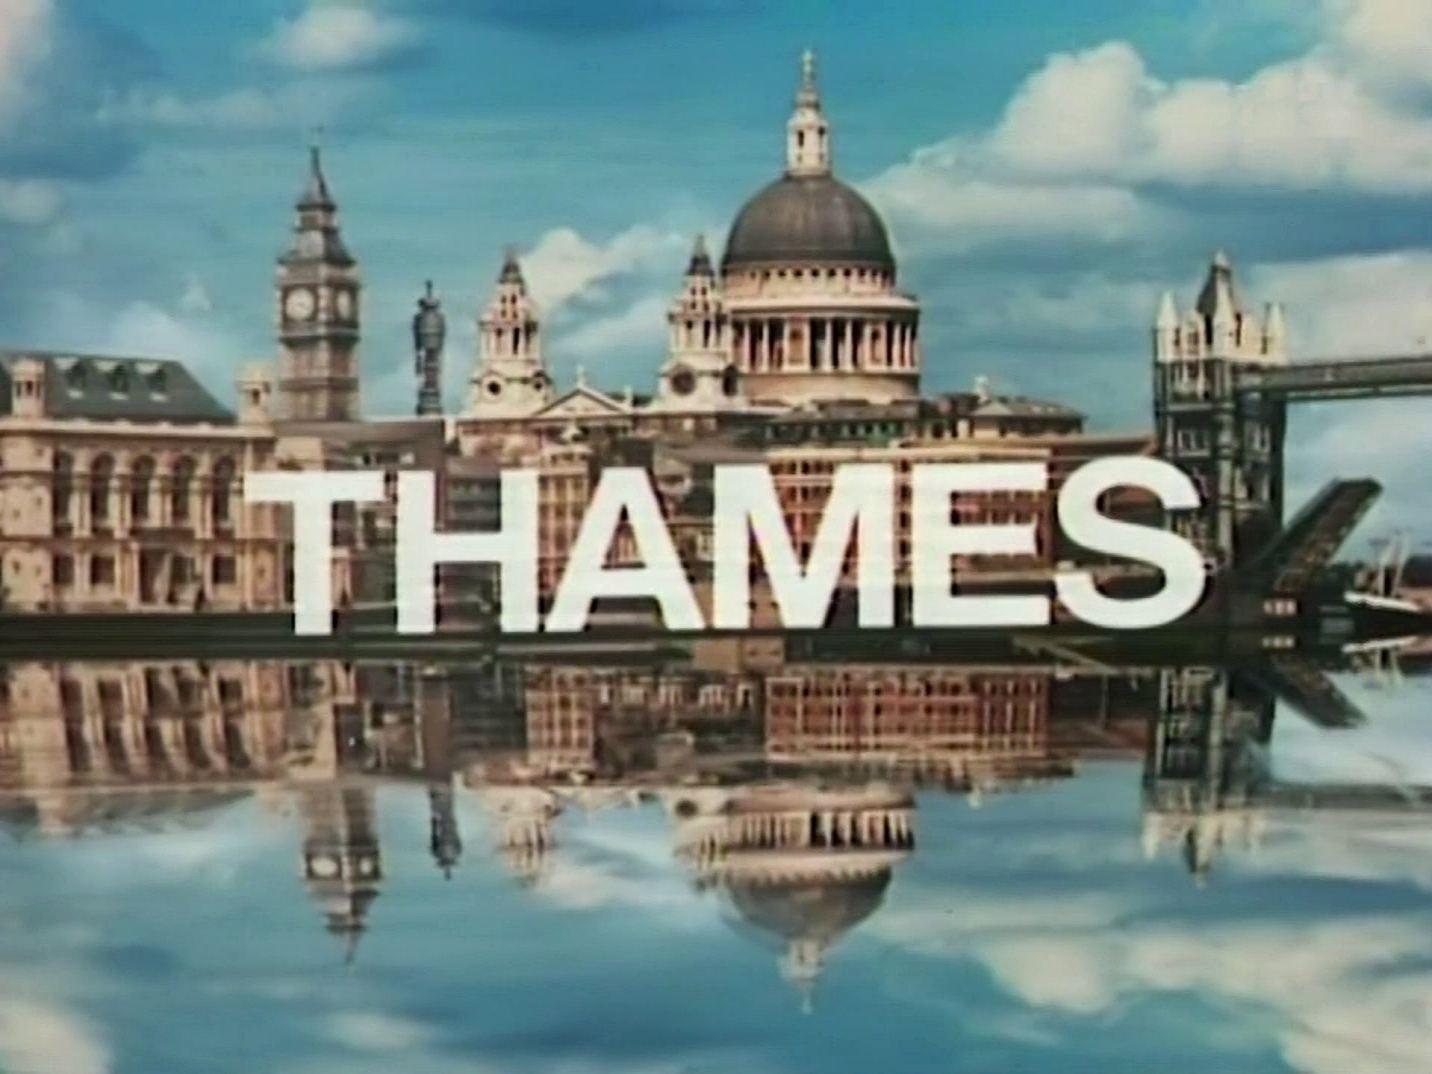 Main title from Season 3 of Shadows (1975-78) (2). Thames